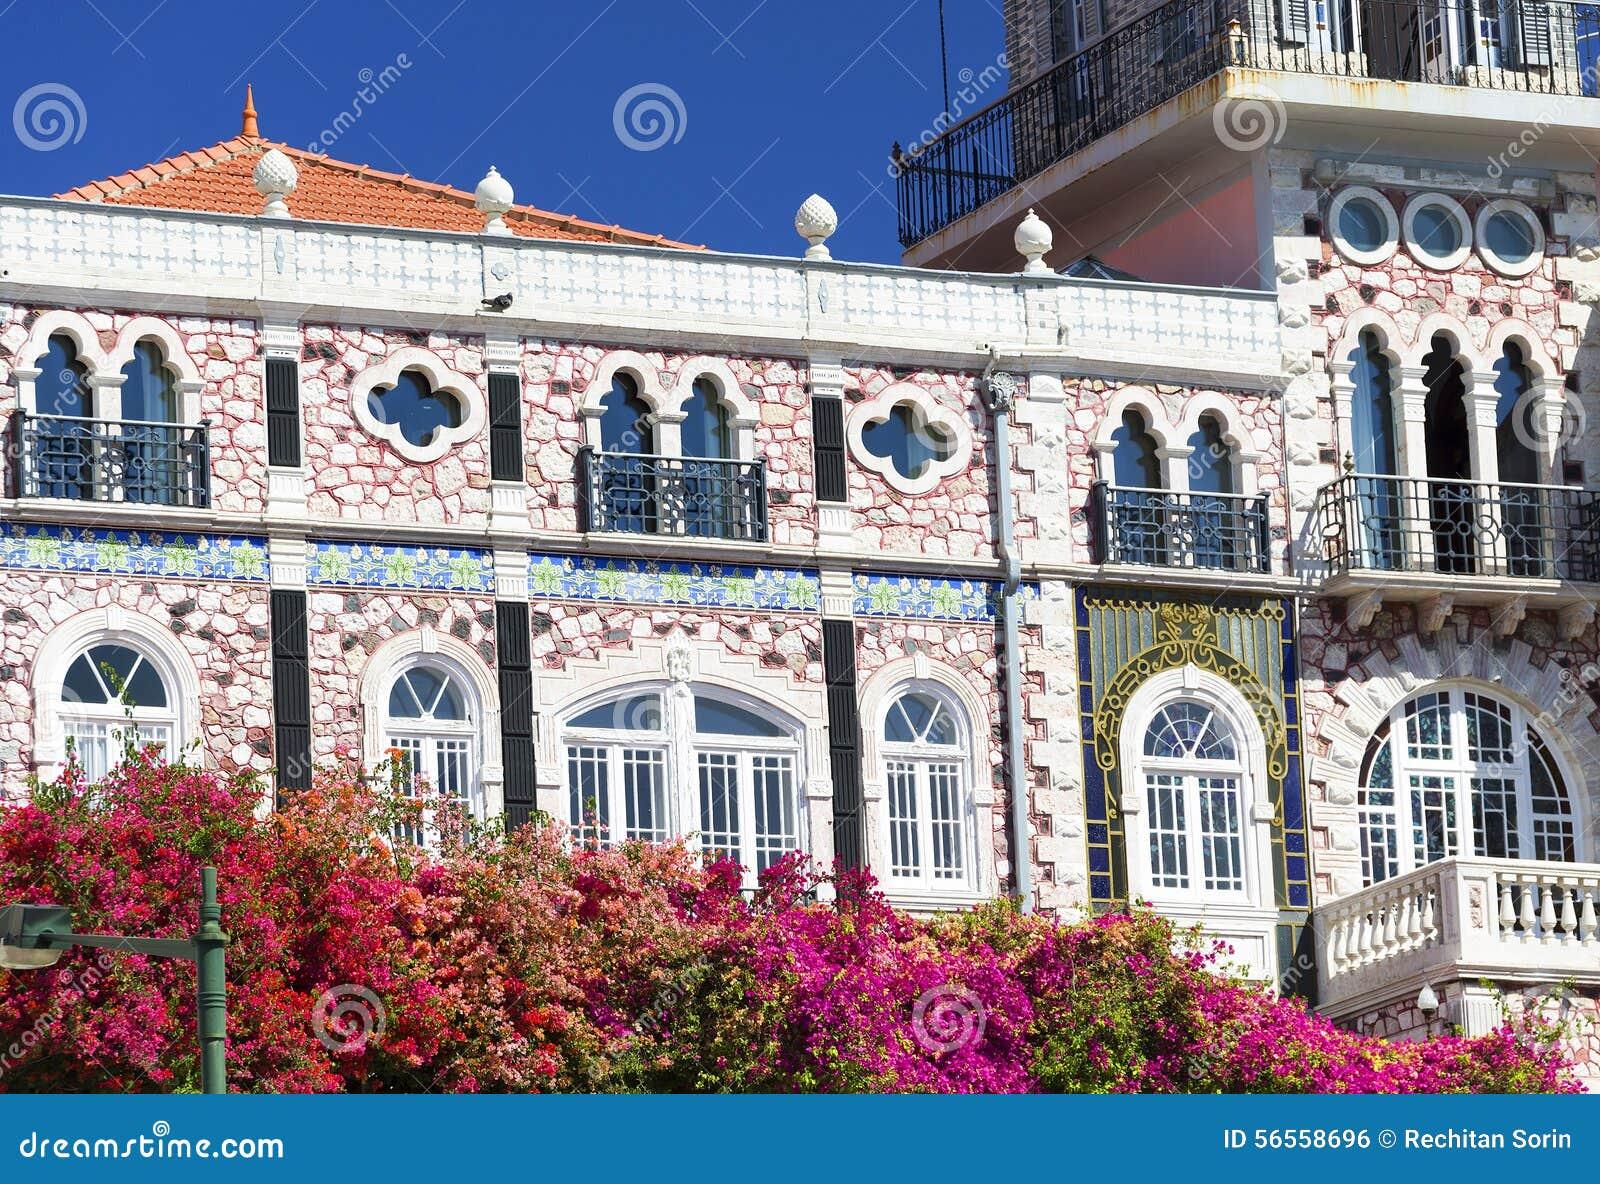 Download Αρχιτεκτονική λεπτομέρεια στη Λισσαβώνα Στοκ Εικόνες - εικόνα από μεσογειακός, ιστορικός: 56558696